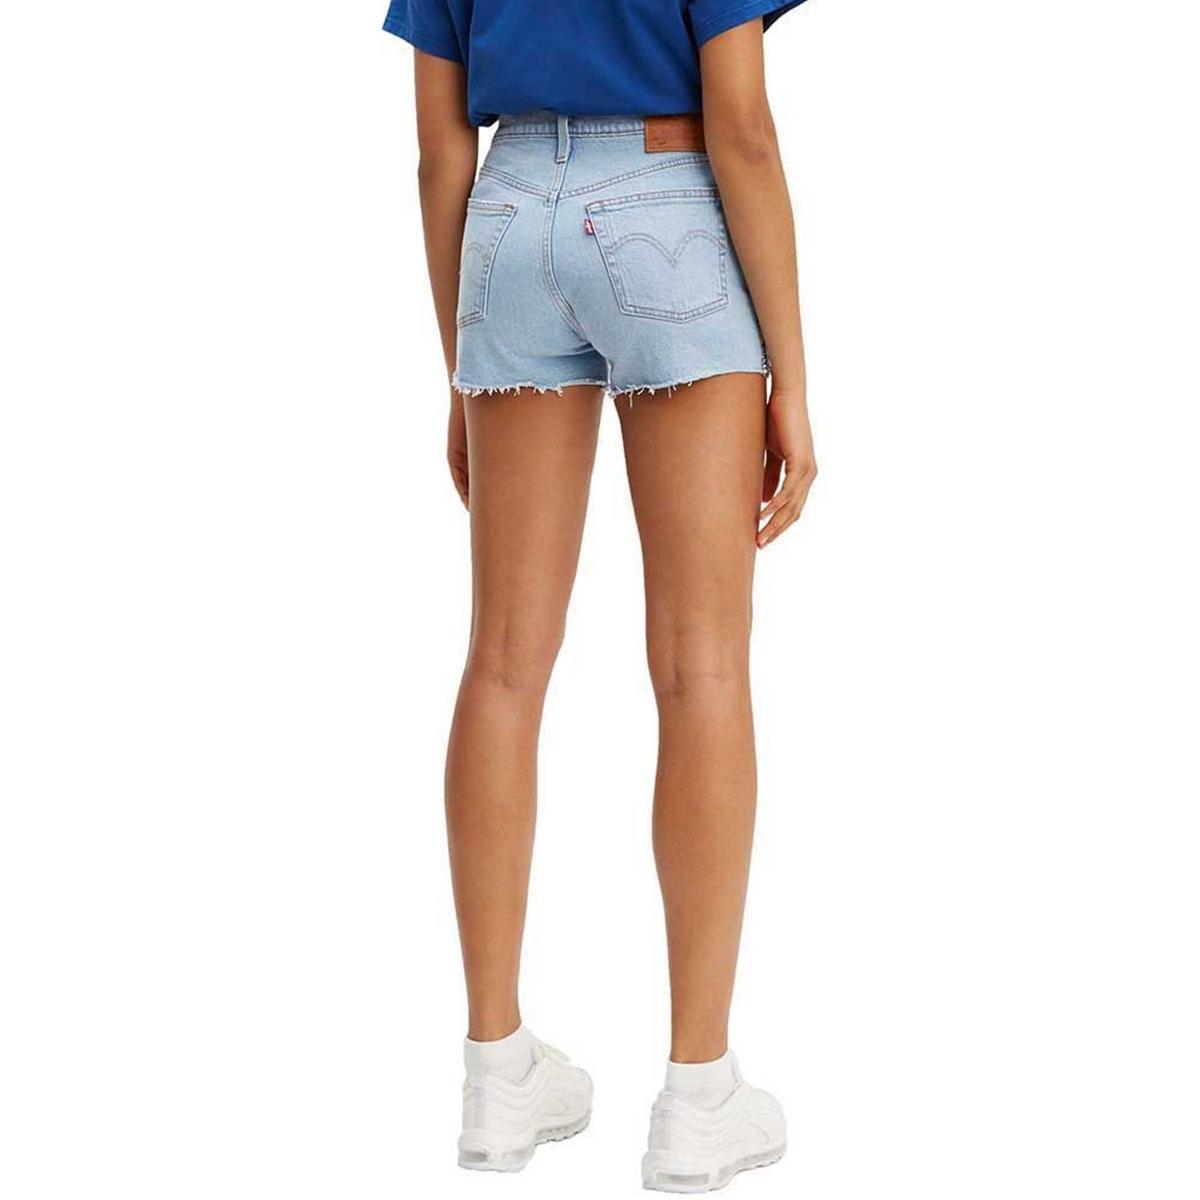 Shorts Levi's 501® High-Waisted Short denim jeans da donna rif. 56327-0042